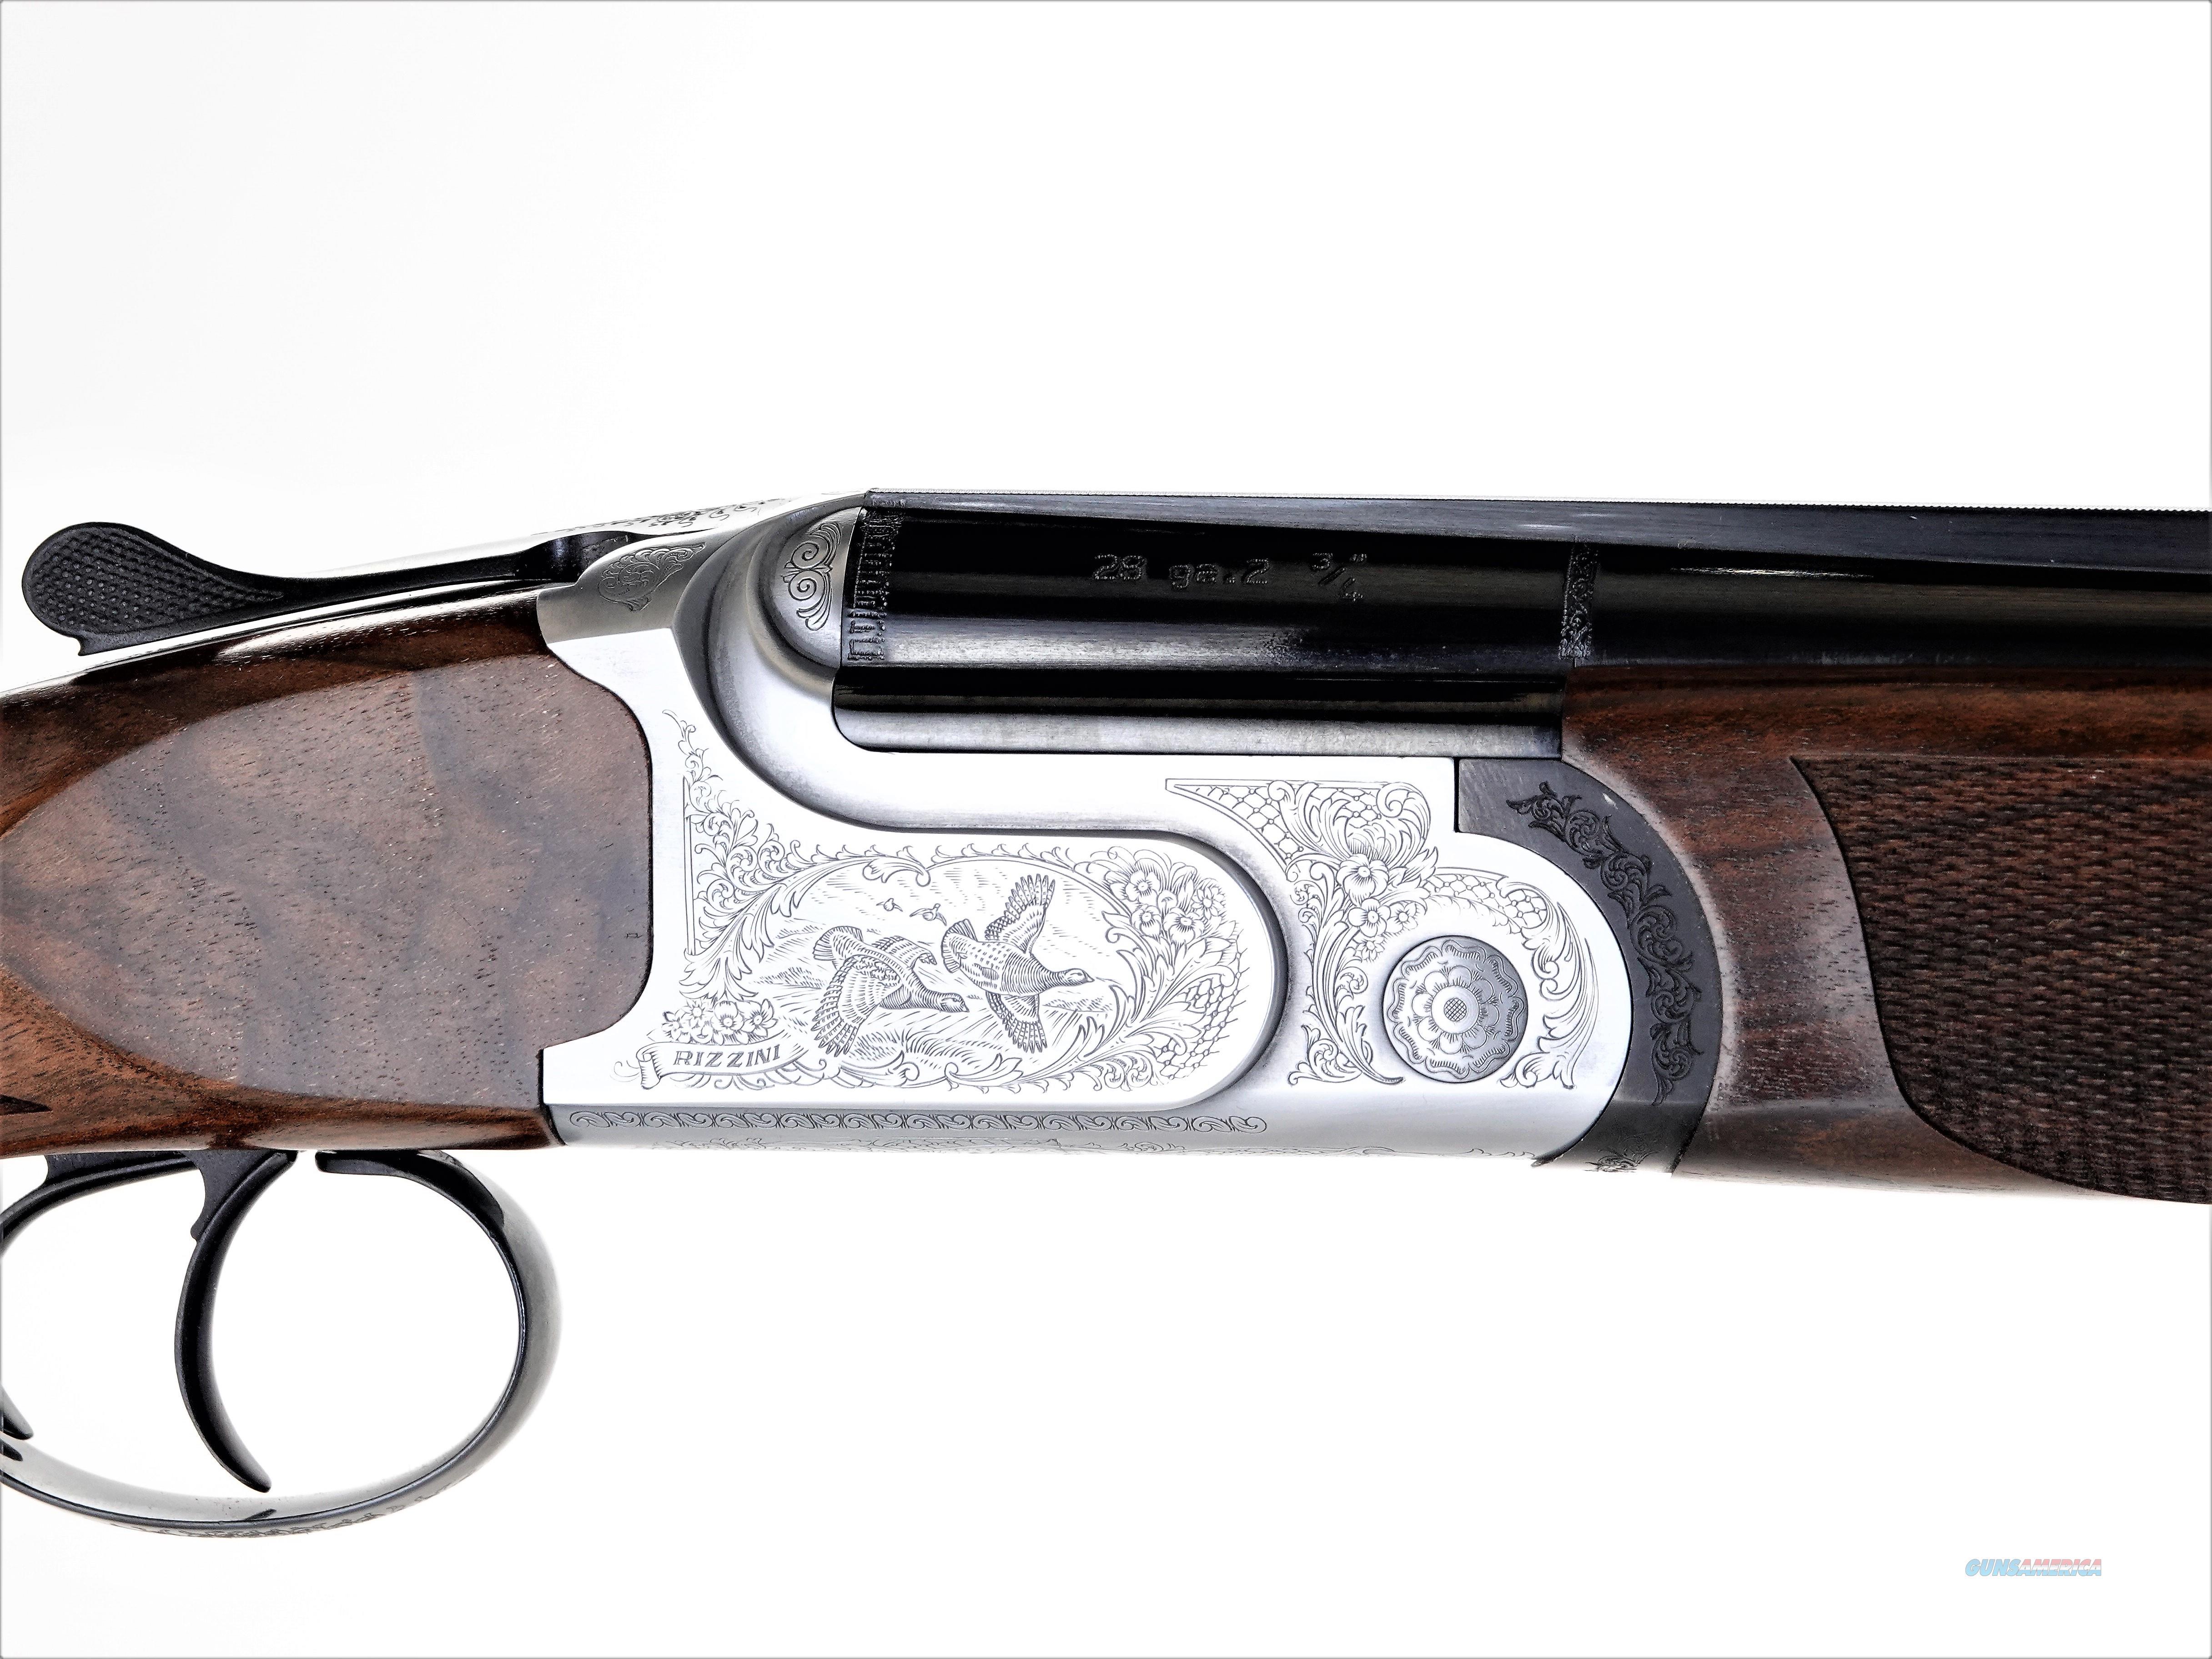 "B. Rizzini - Aurum Small Action, 28ga./410ga. 30"" Barrels  Guns > Shotguns > Rizzini Shotguns"